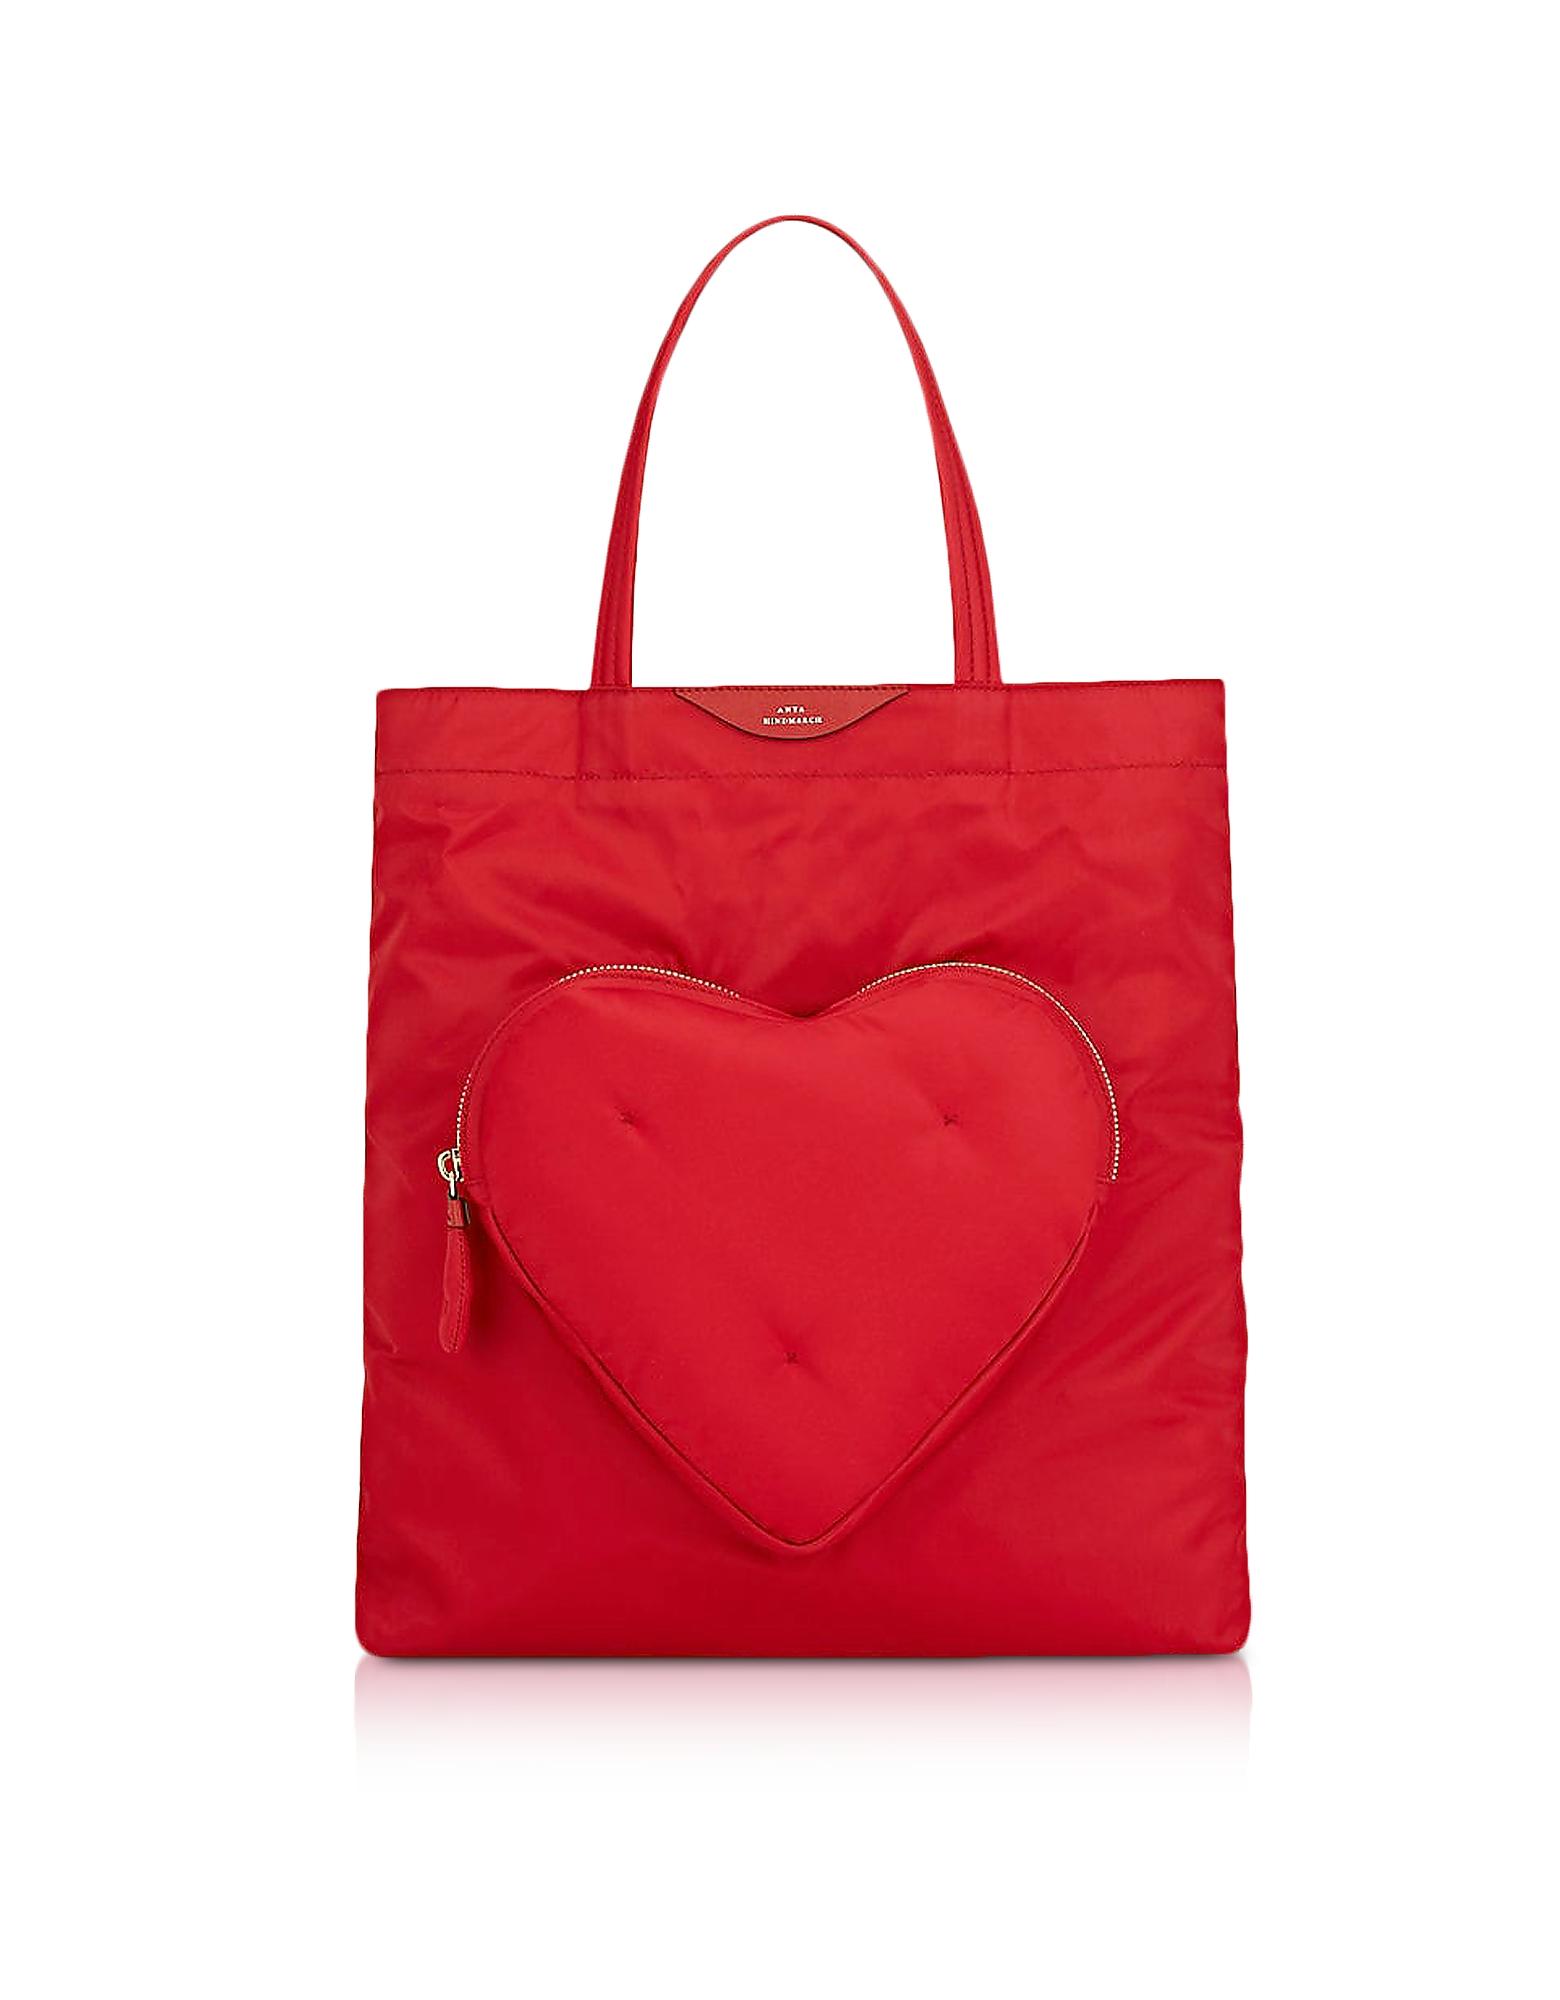 Image of Anya Hindmarch Designer Handbags, Red Nylon Chubby Heart Tote Bag